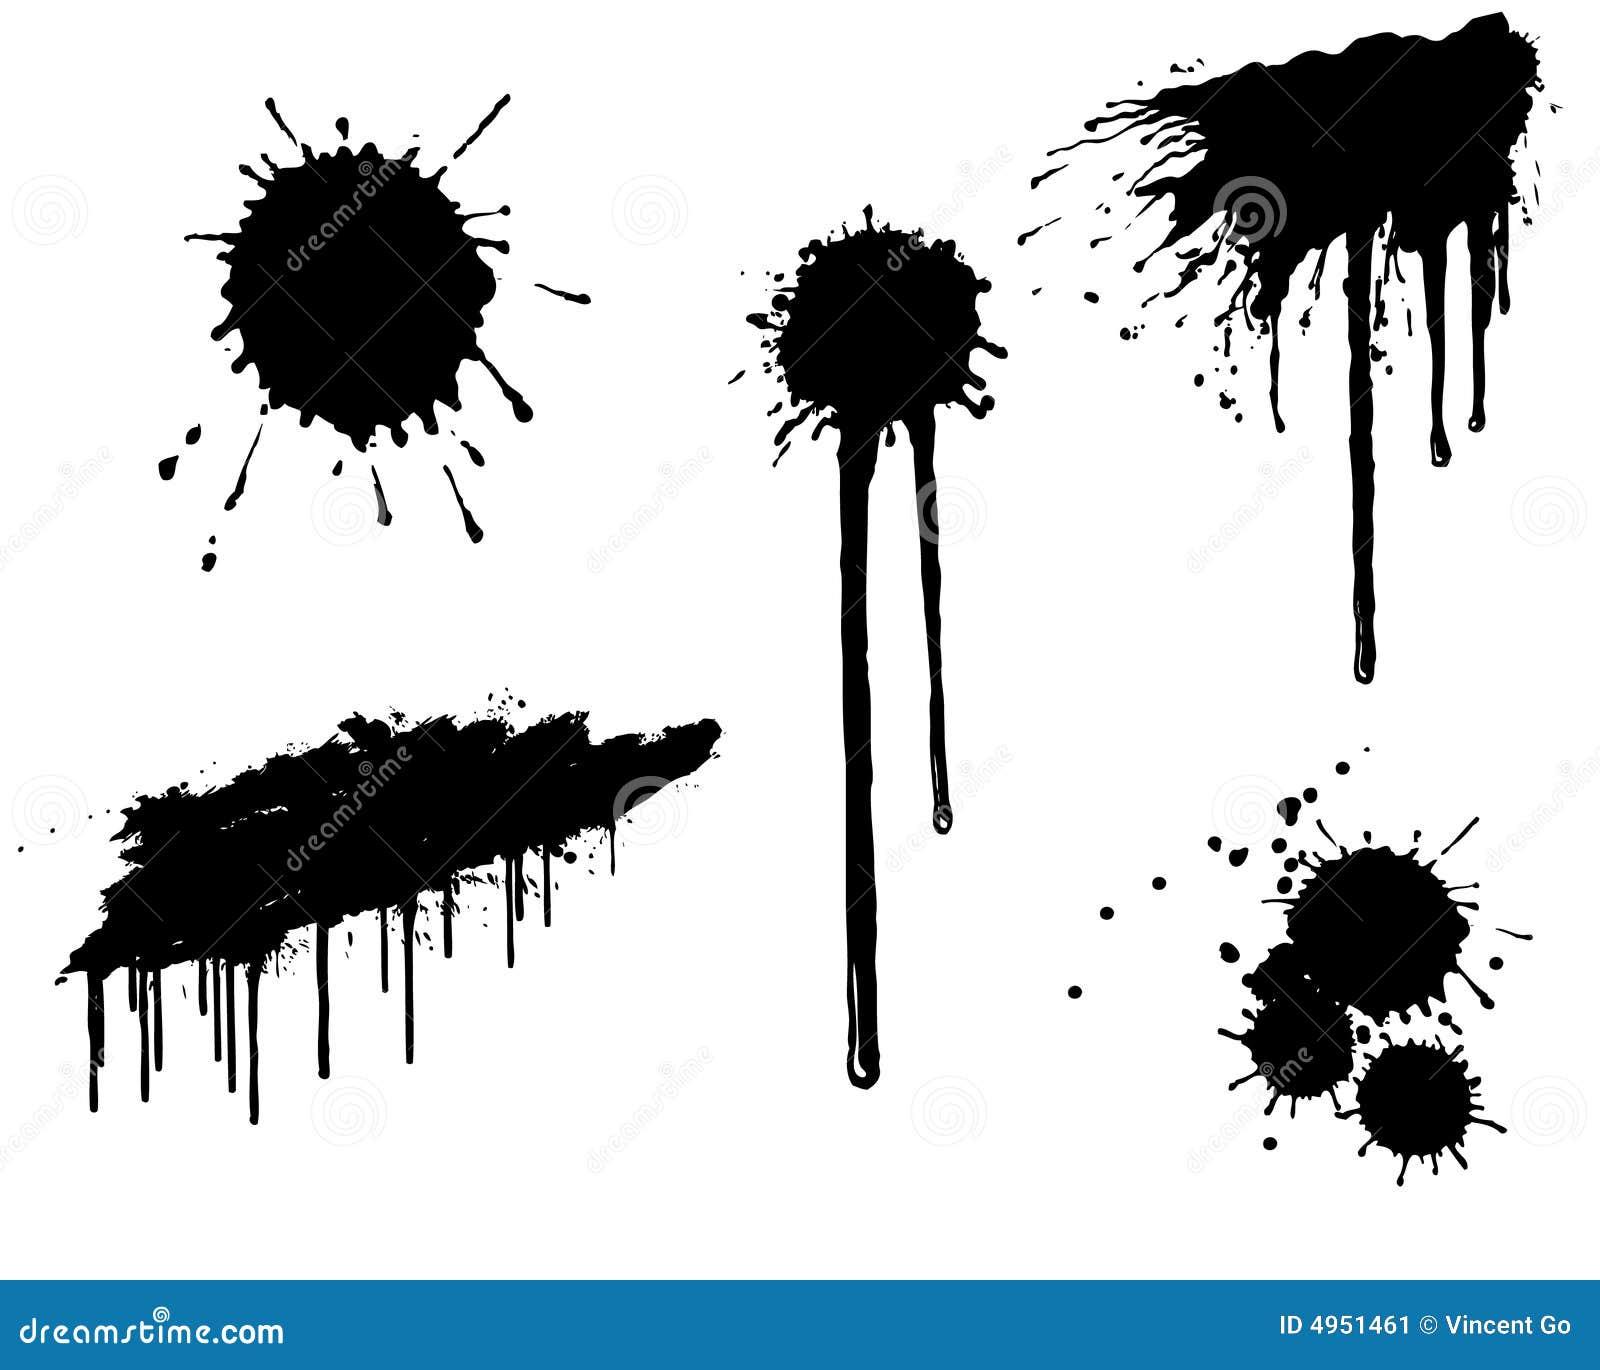 ink splatter stock vector illustration of grunge design